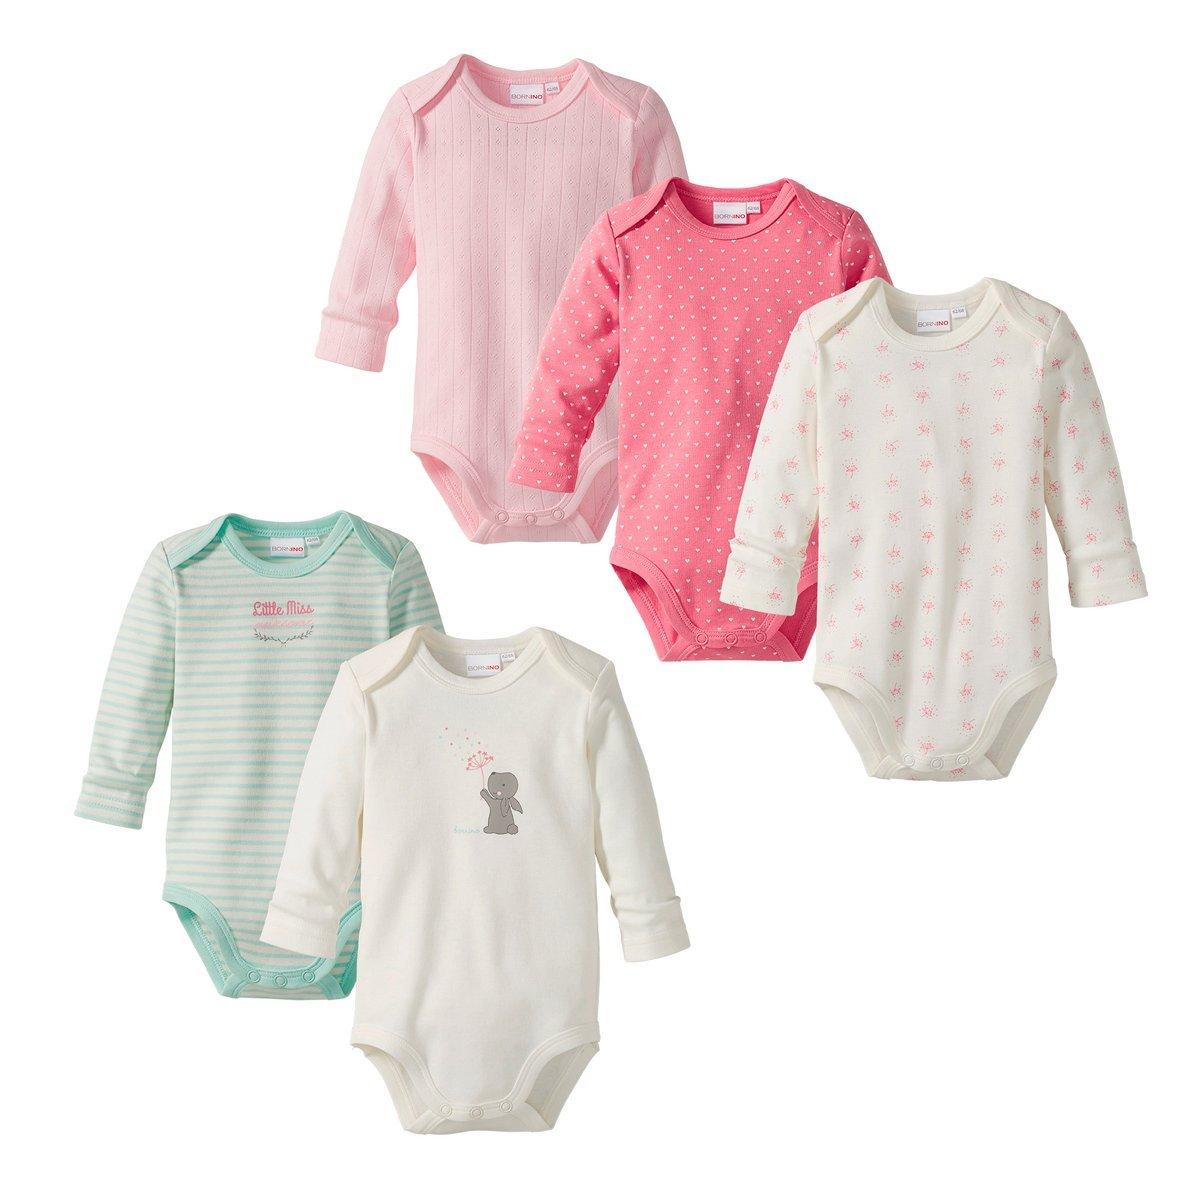 Bornino 5er Pack Bodys Langarm/Baby Bekleidung Mädchen / 100% Baumwolle/rosé/wollweiß/Aqua